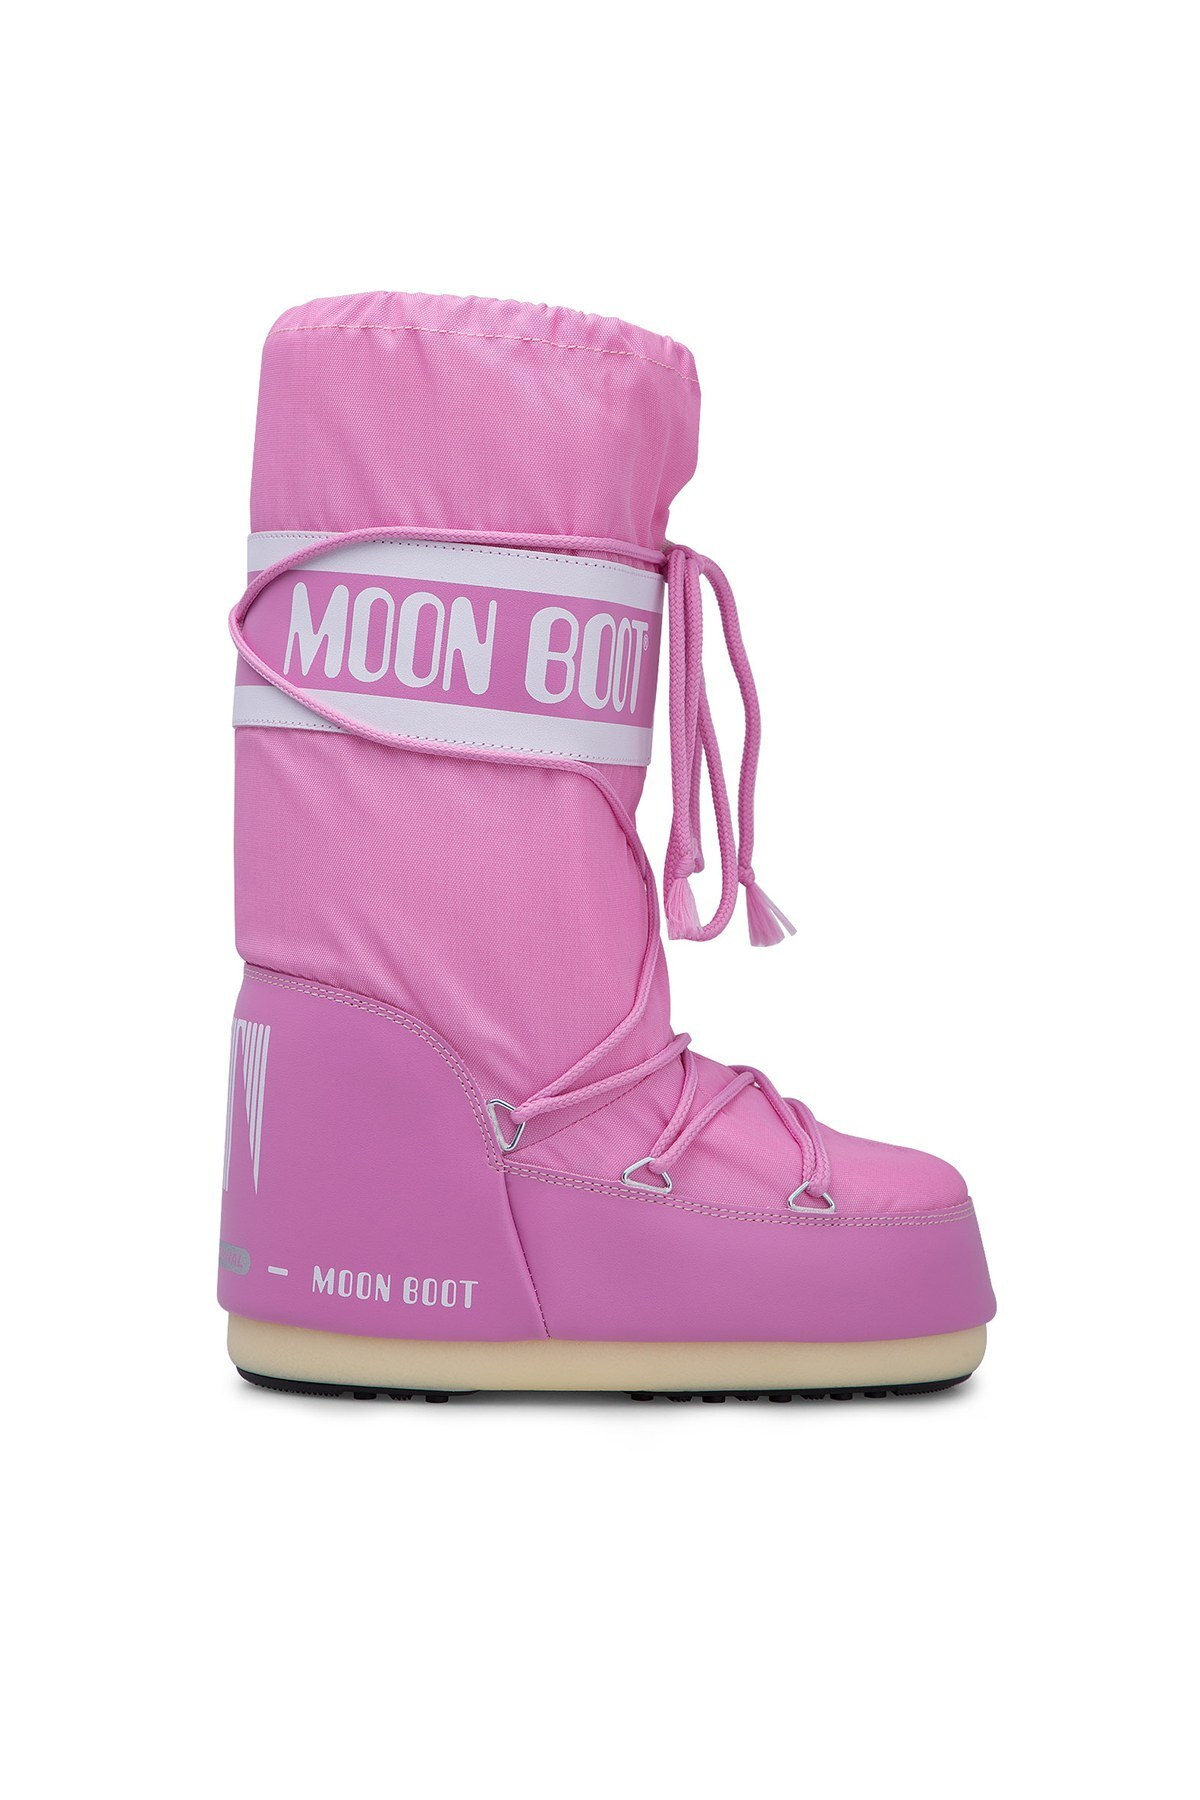 Moon Boot Bayan Kar Botu 14004400 063 PEMBE